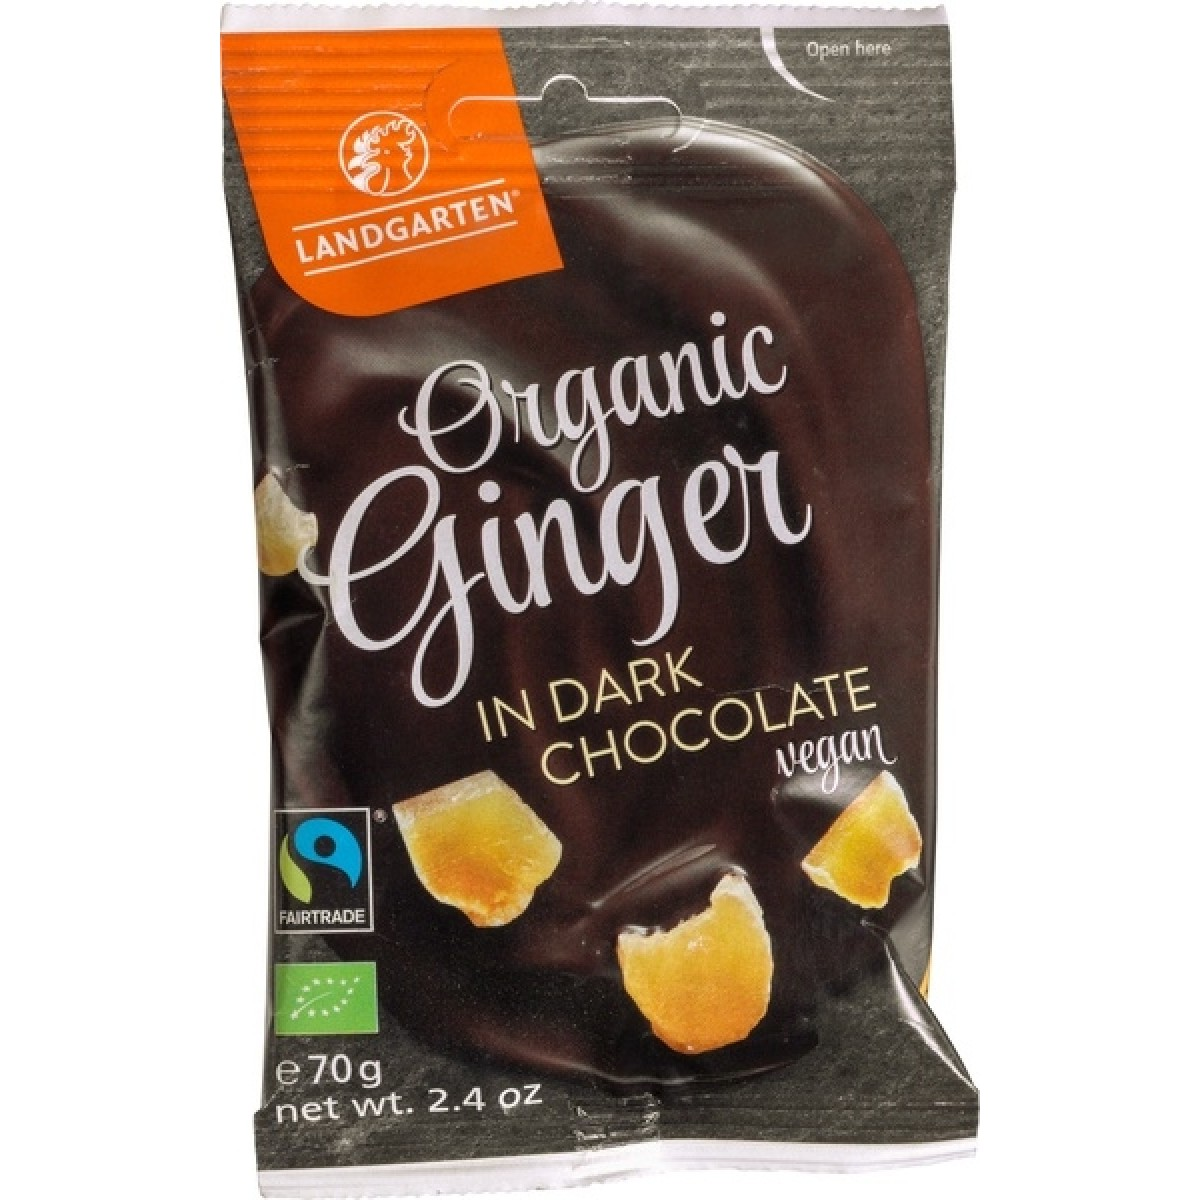 Ginger In Dark Chocolate